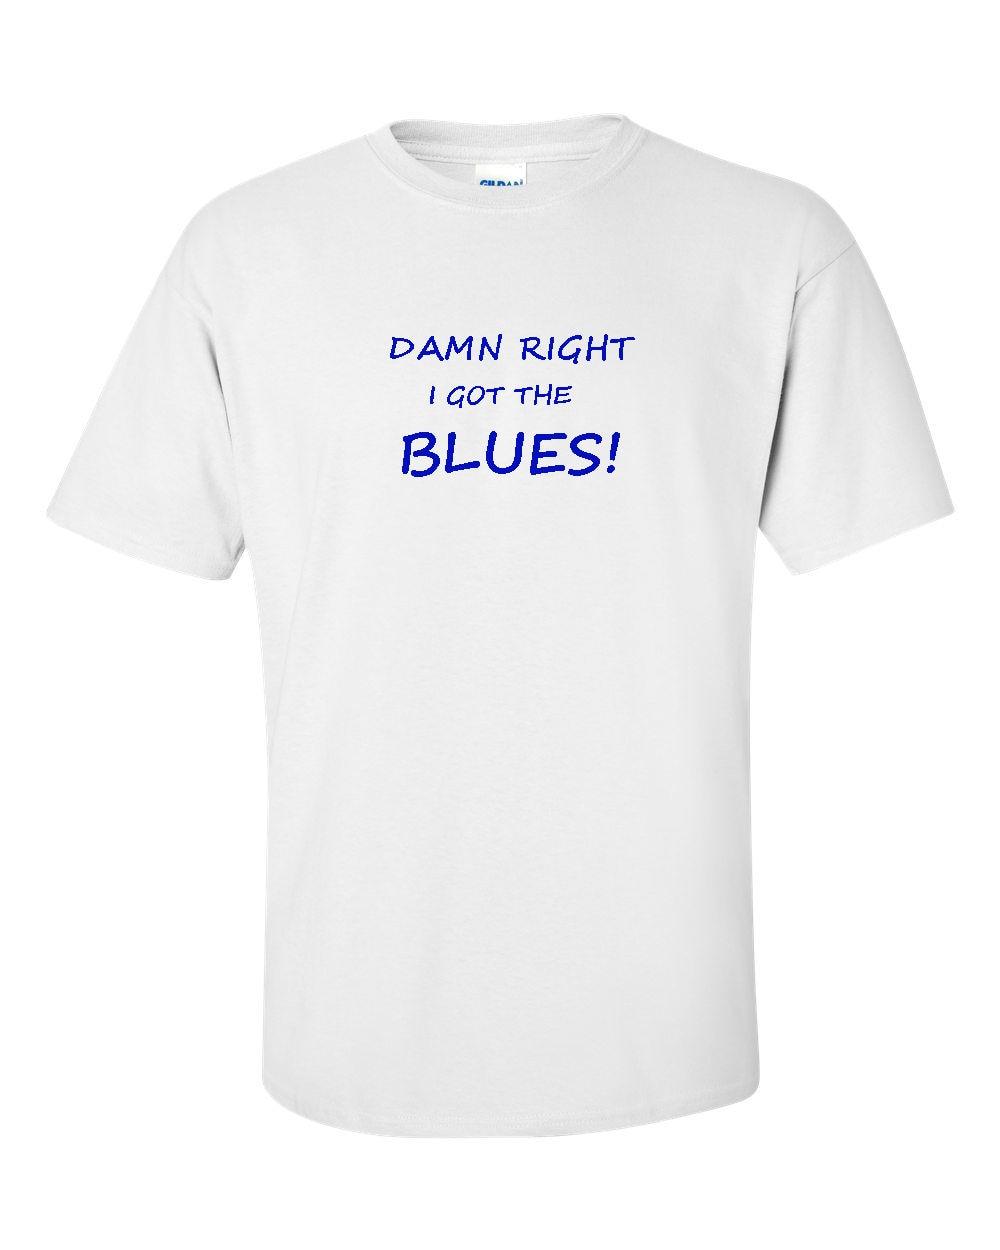 "Camiseta con el lema ""I Got The Blues""-BB Freddie Albert King Buddy Guy Hendrix, nuevas camisetas divertidas, camisetas nuevas Unisex, divertidas camisetas"